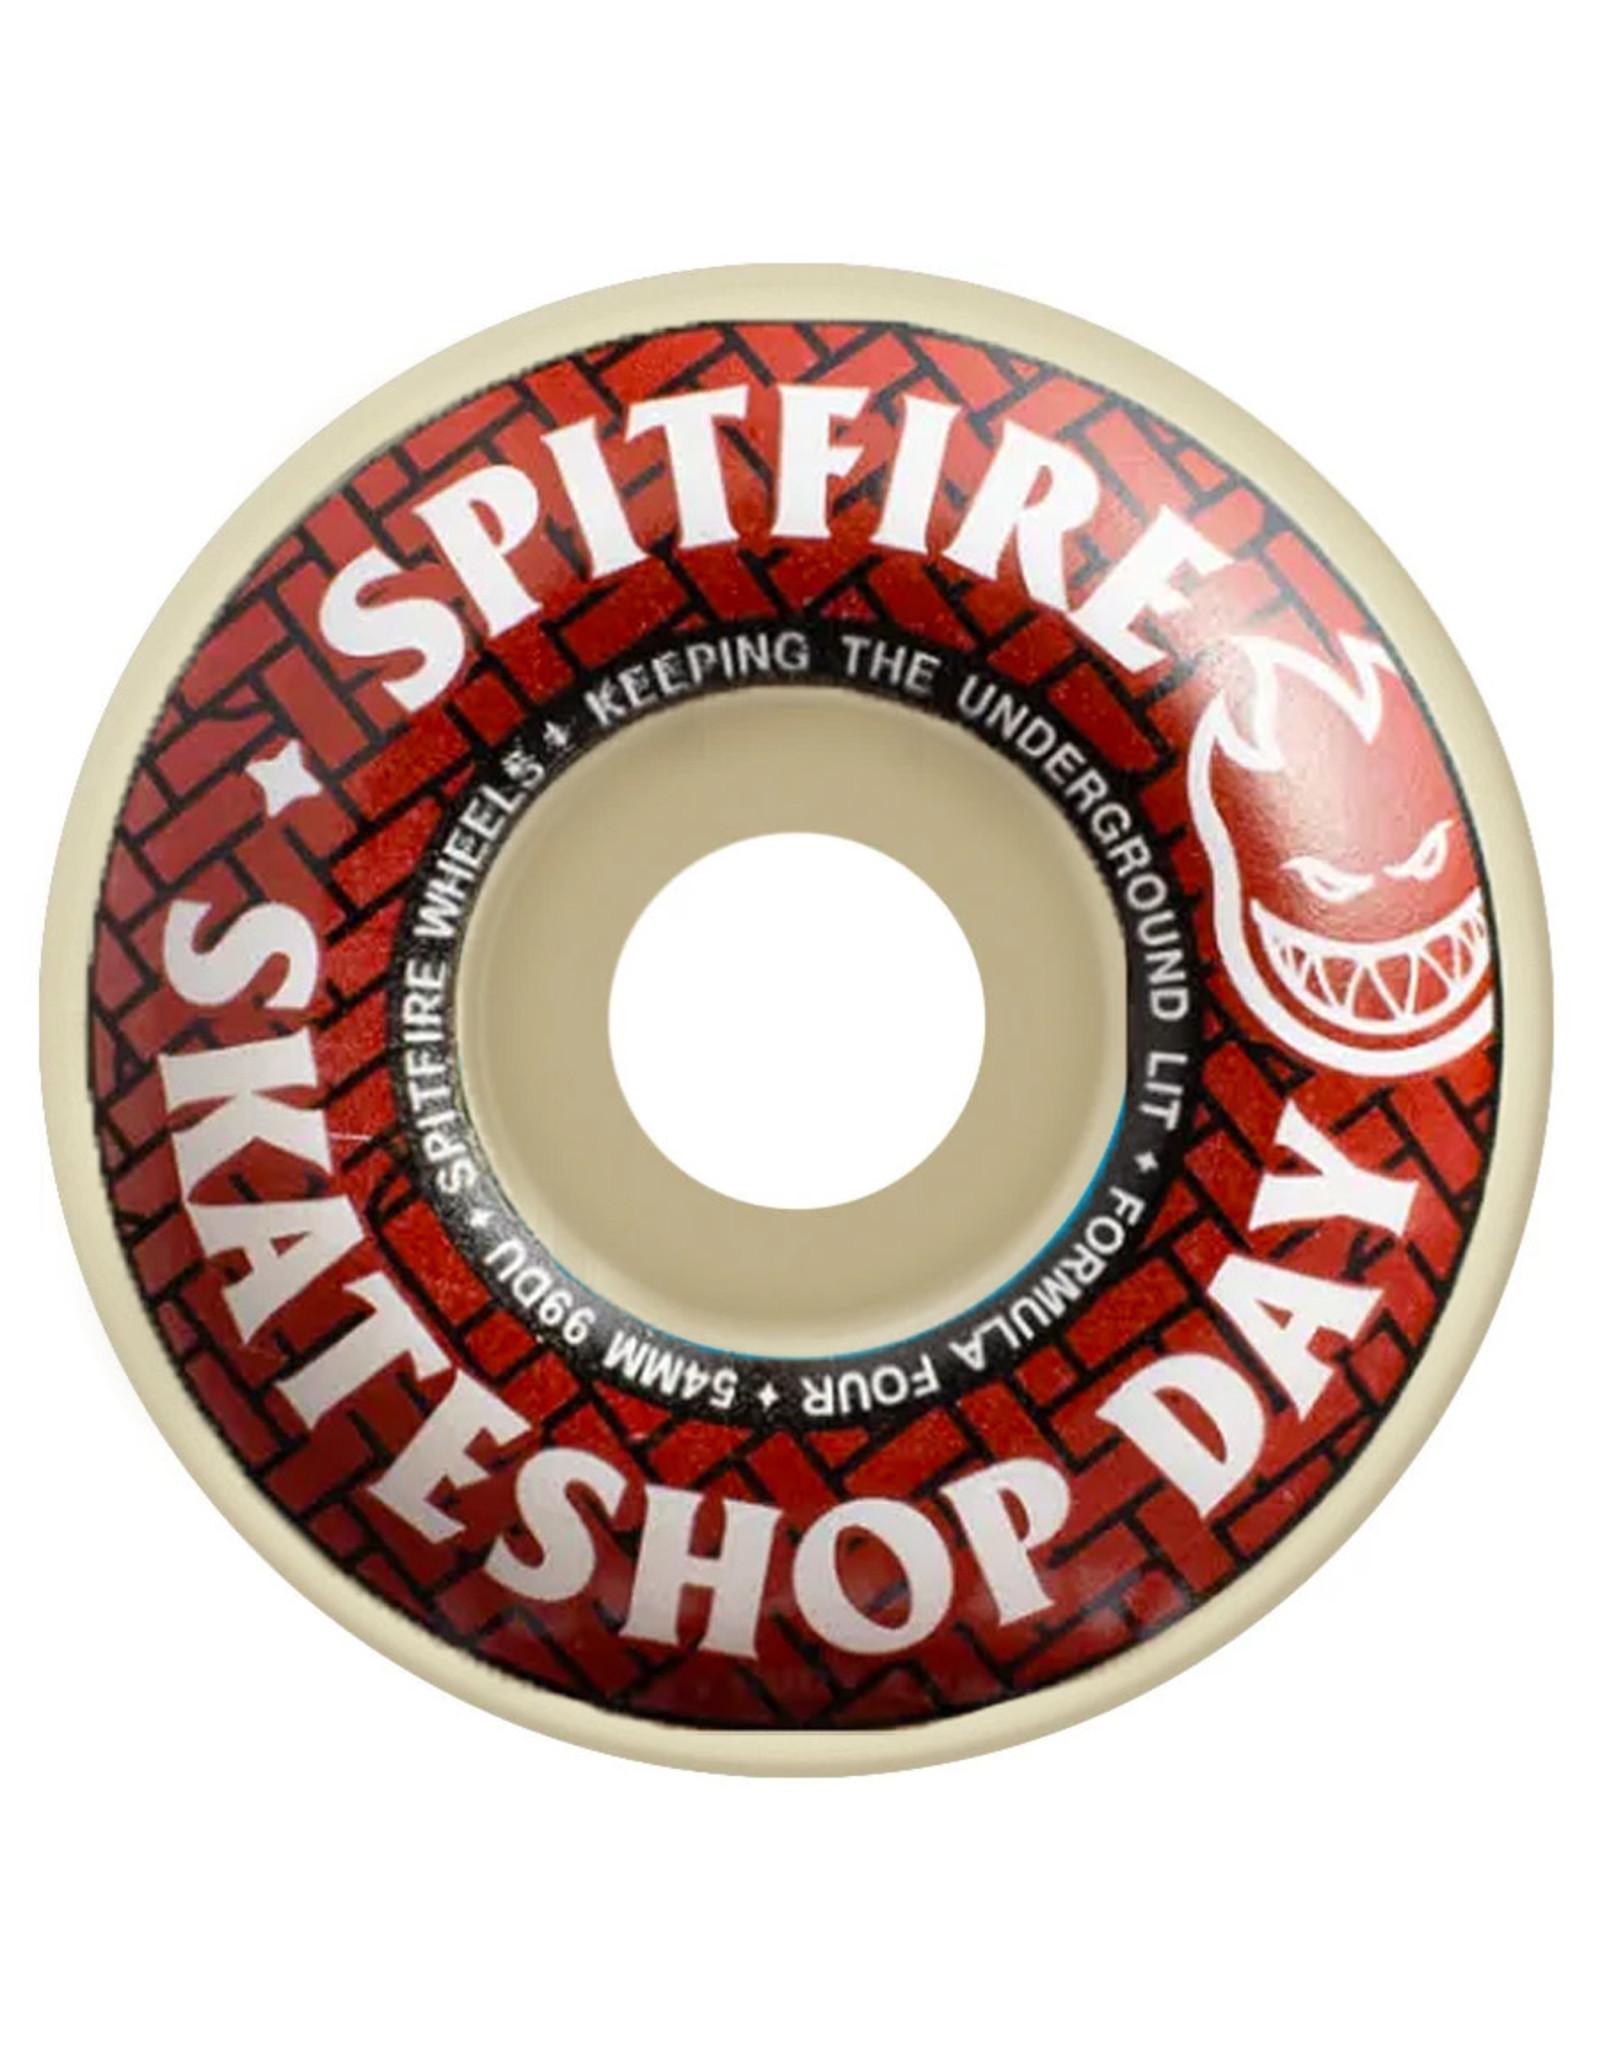 Spitfire Spitfire Wheels Formula Four Skate Shop Day Classic White (52mm/99d)